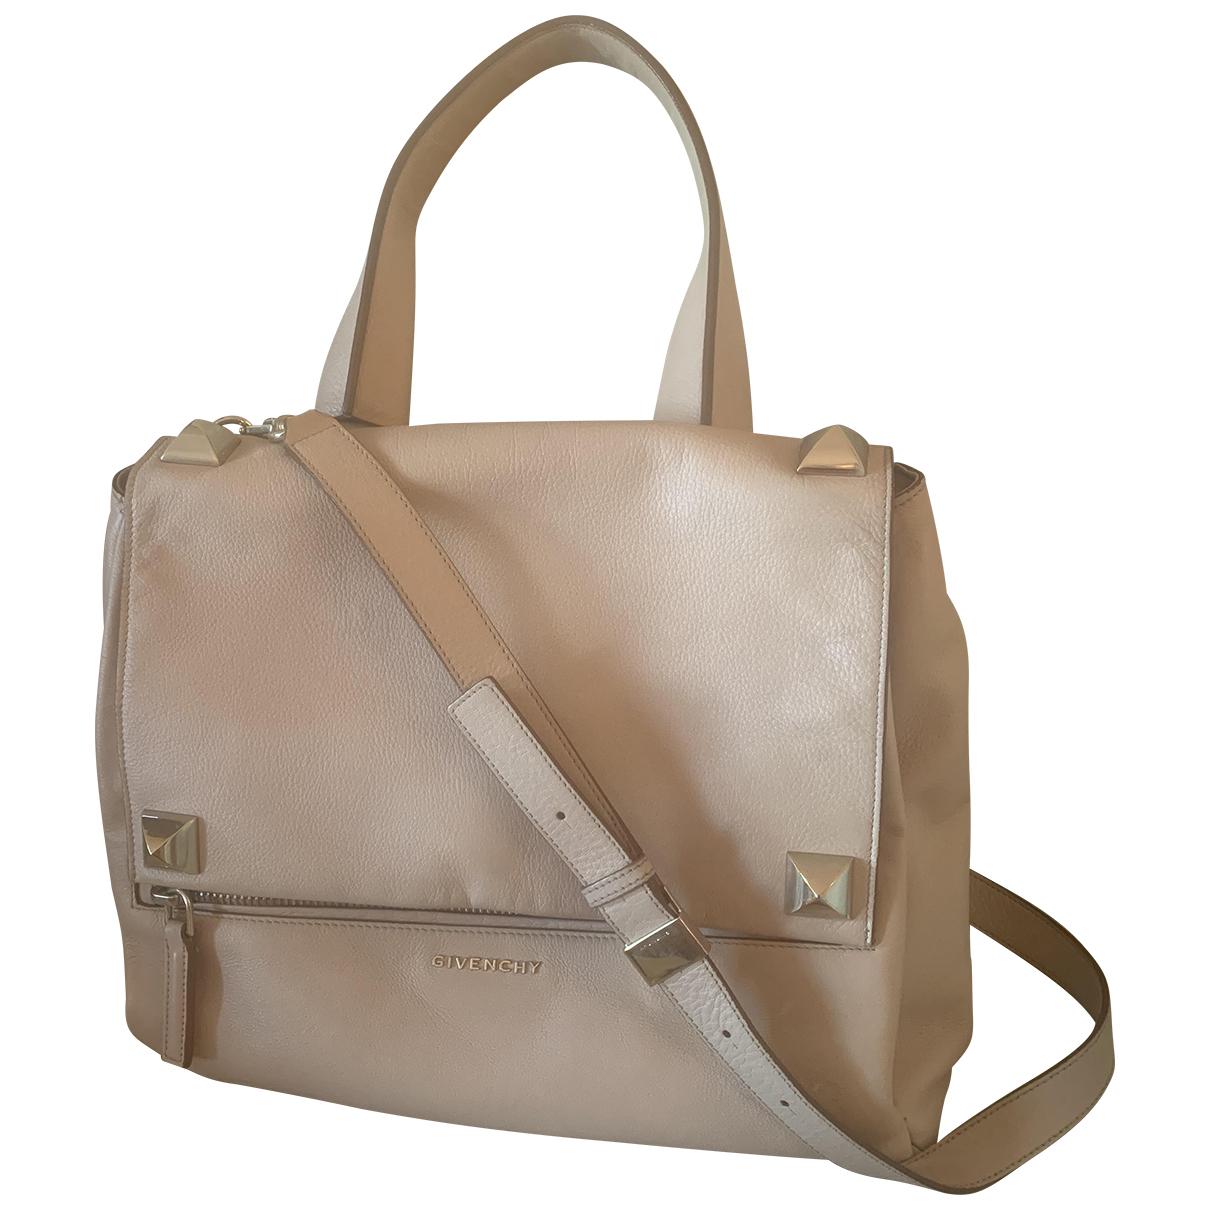 Givenchy Pandora Ecru Leather handbag for Women N